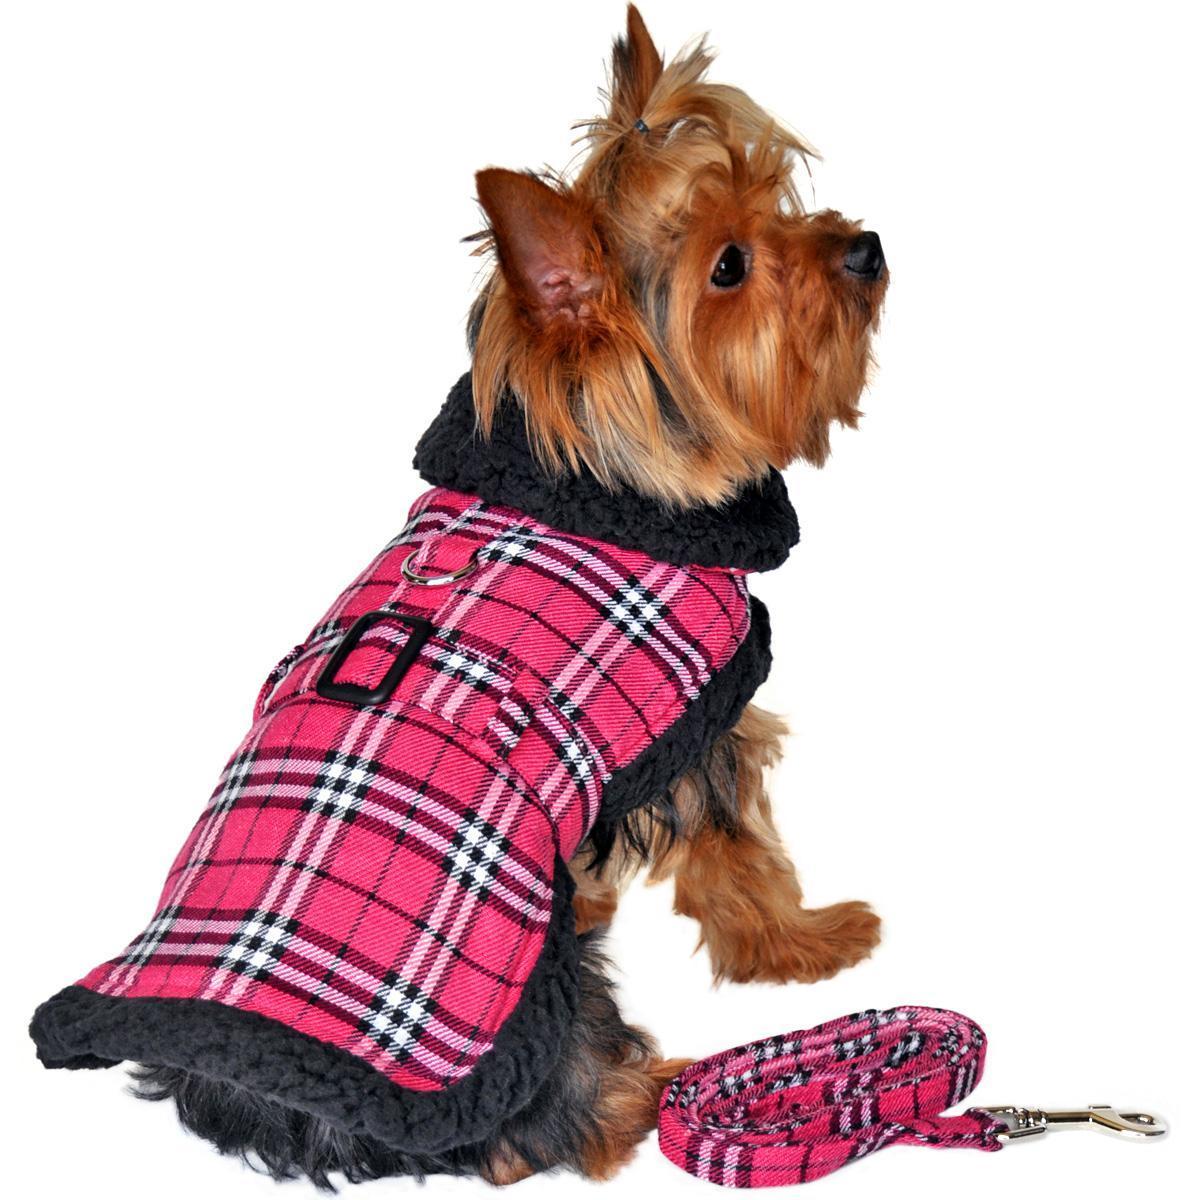 Doggie Design Plaid Sherpa Fleece Lined Dog Harness Coat - Hot Pink & Black